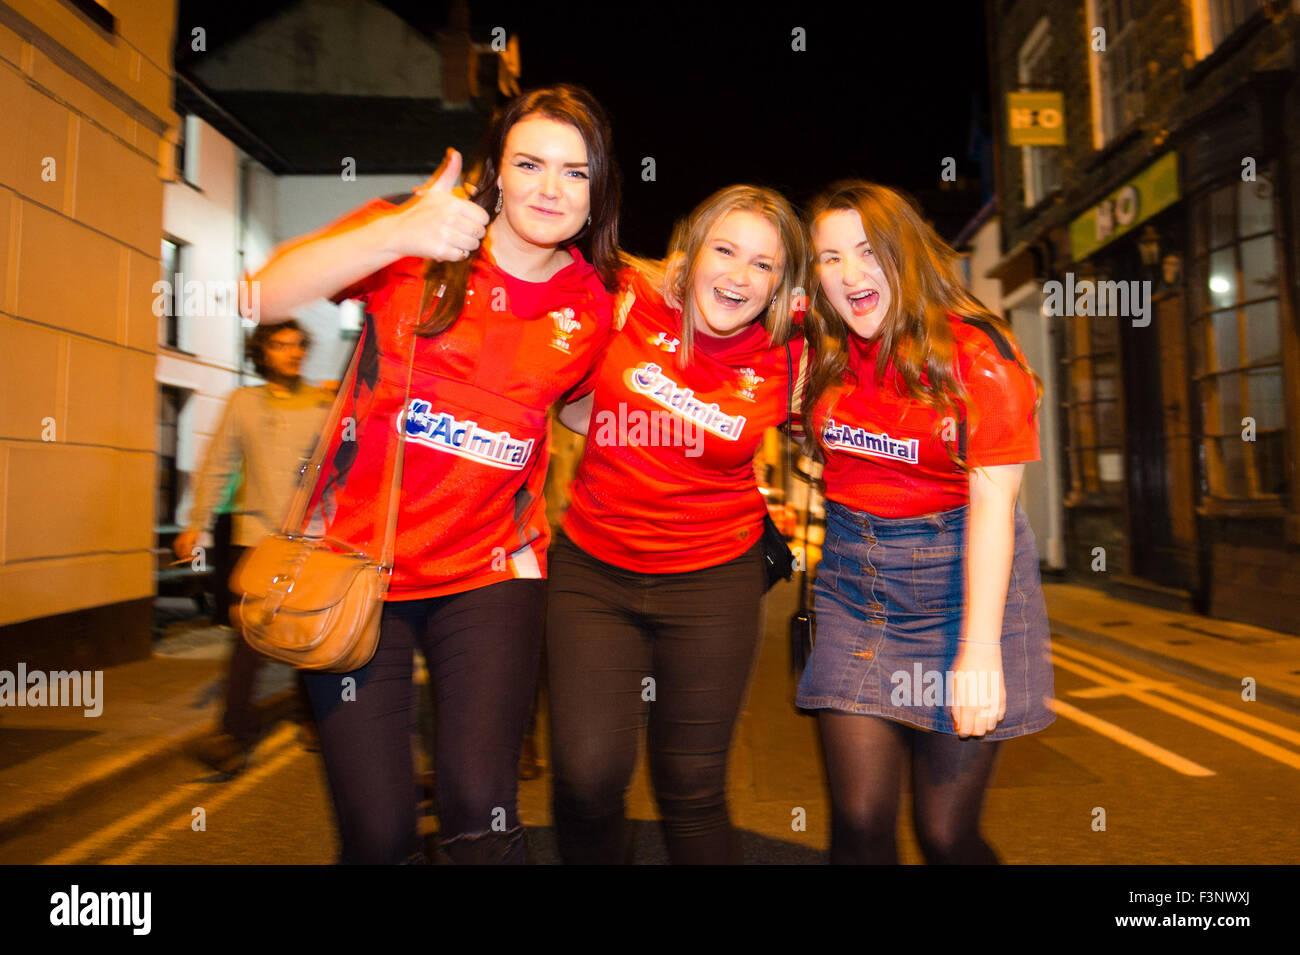 Aberystwyth Wales Uk, Saturday 10 October 2015  Three Welsh football  fans outside the Llew Du pub  Hotel in Aberystwyth - Stock Image